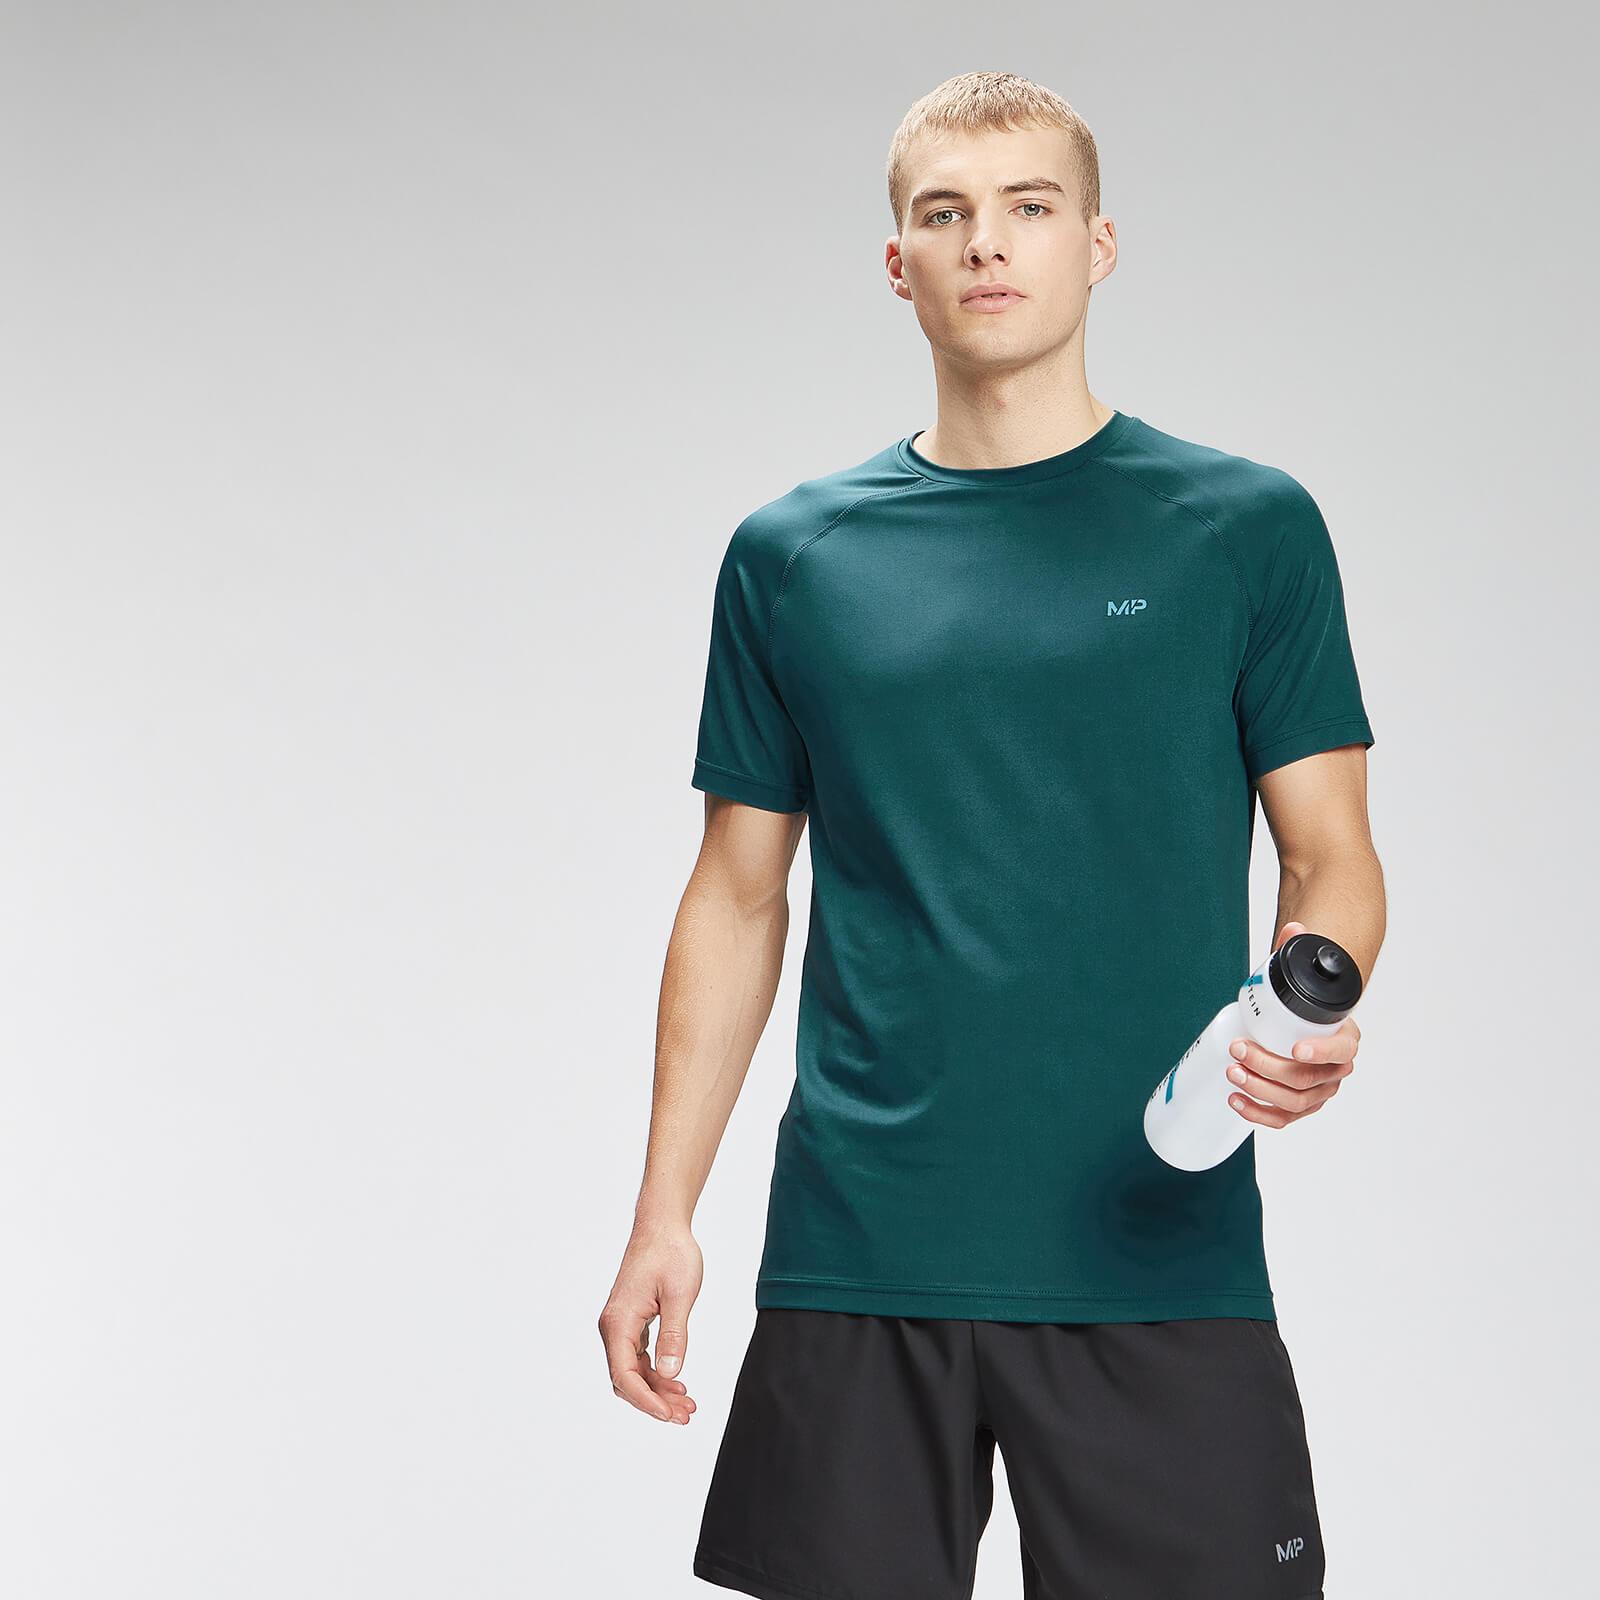 Купить MP Men's Repeat Graphic Training Short Sleeve T-Shirt - Deep Teal - XXS, Myprotein International